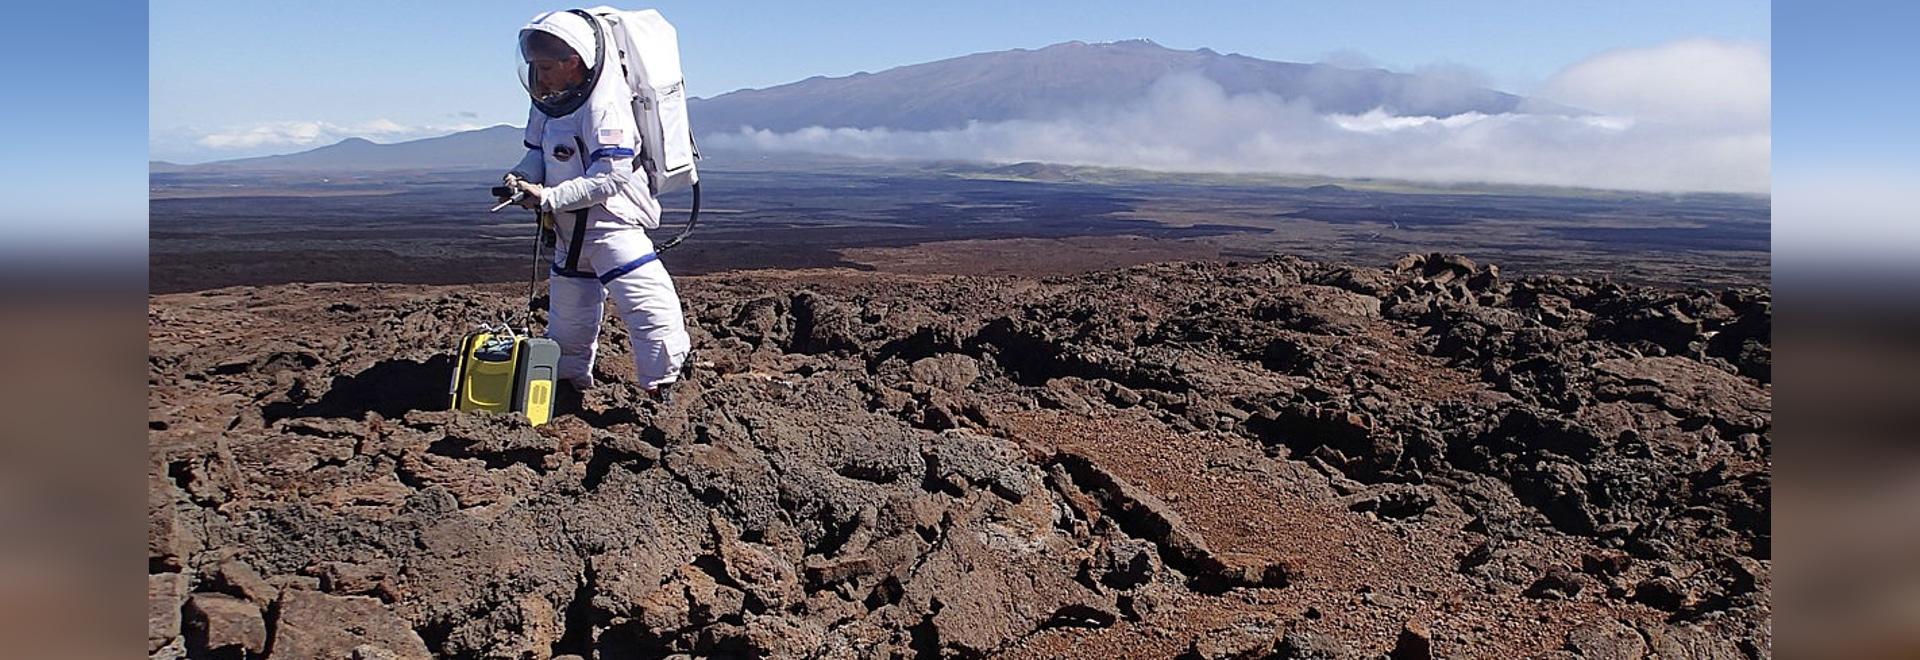 Descubren un gas que permitirá a los humanos respirar en Marte